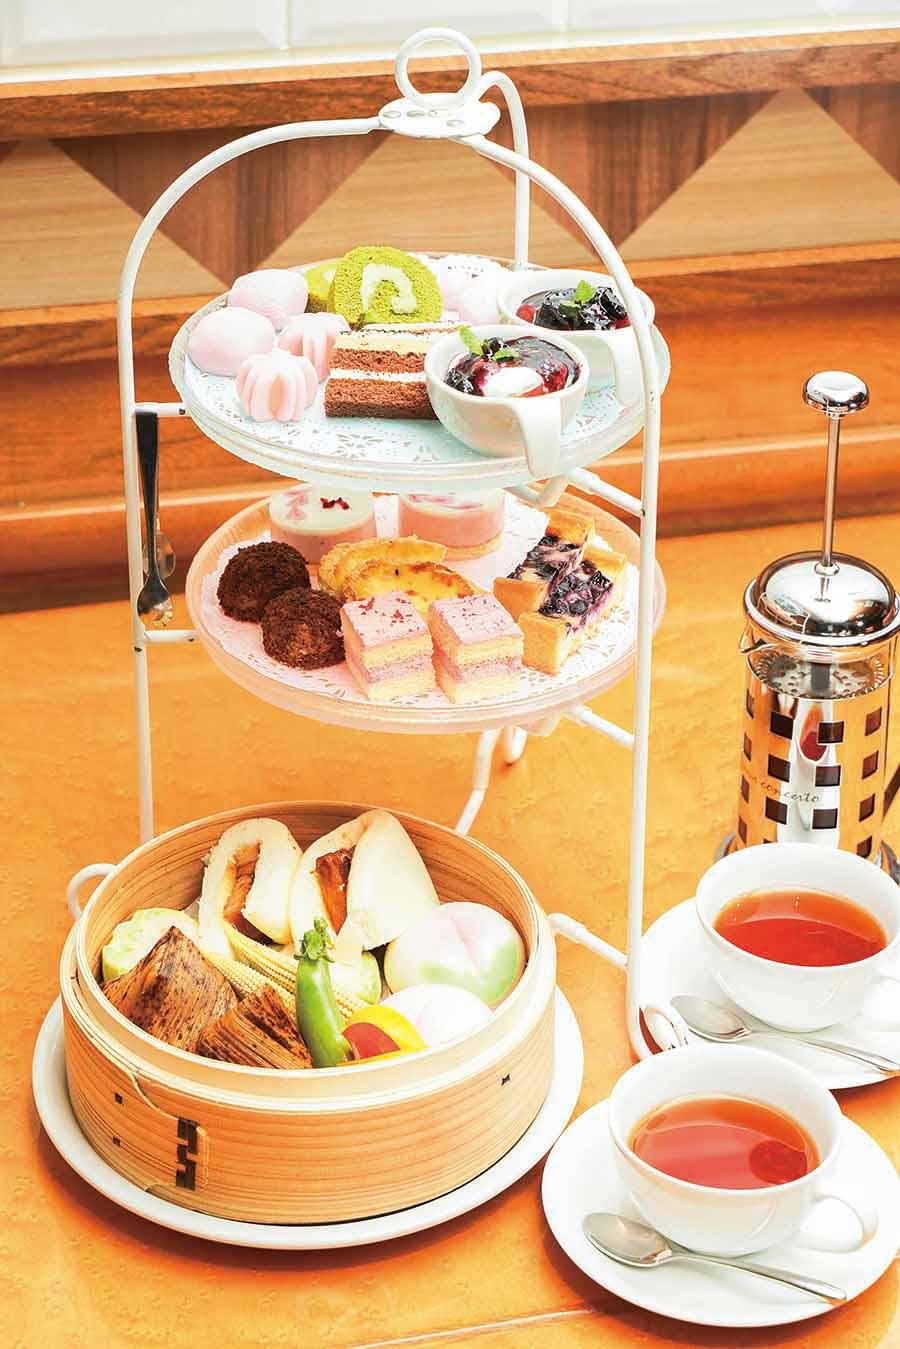 tcc Singaporean Cafe&Diner アフタヌーンティーセット